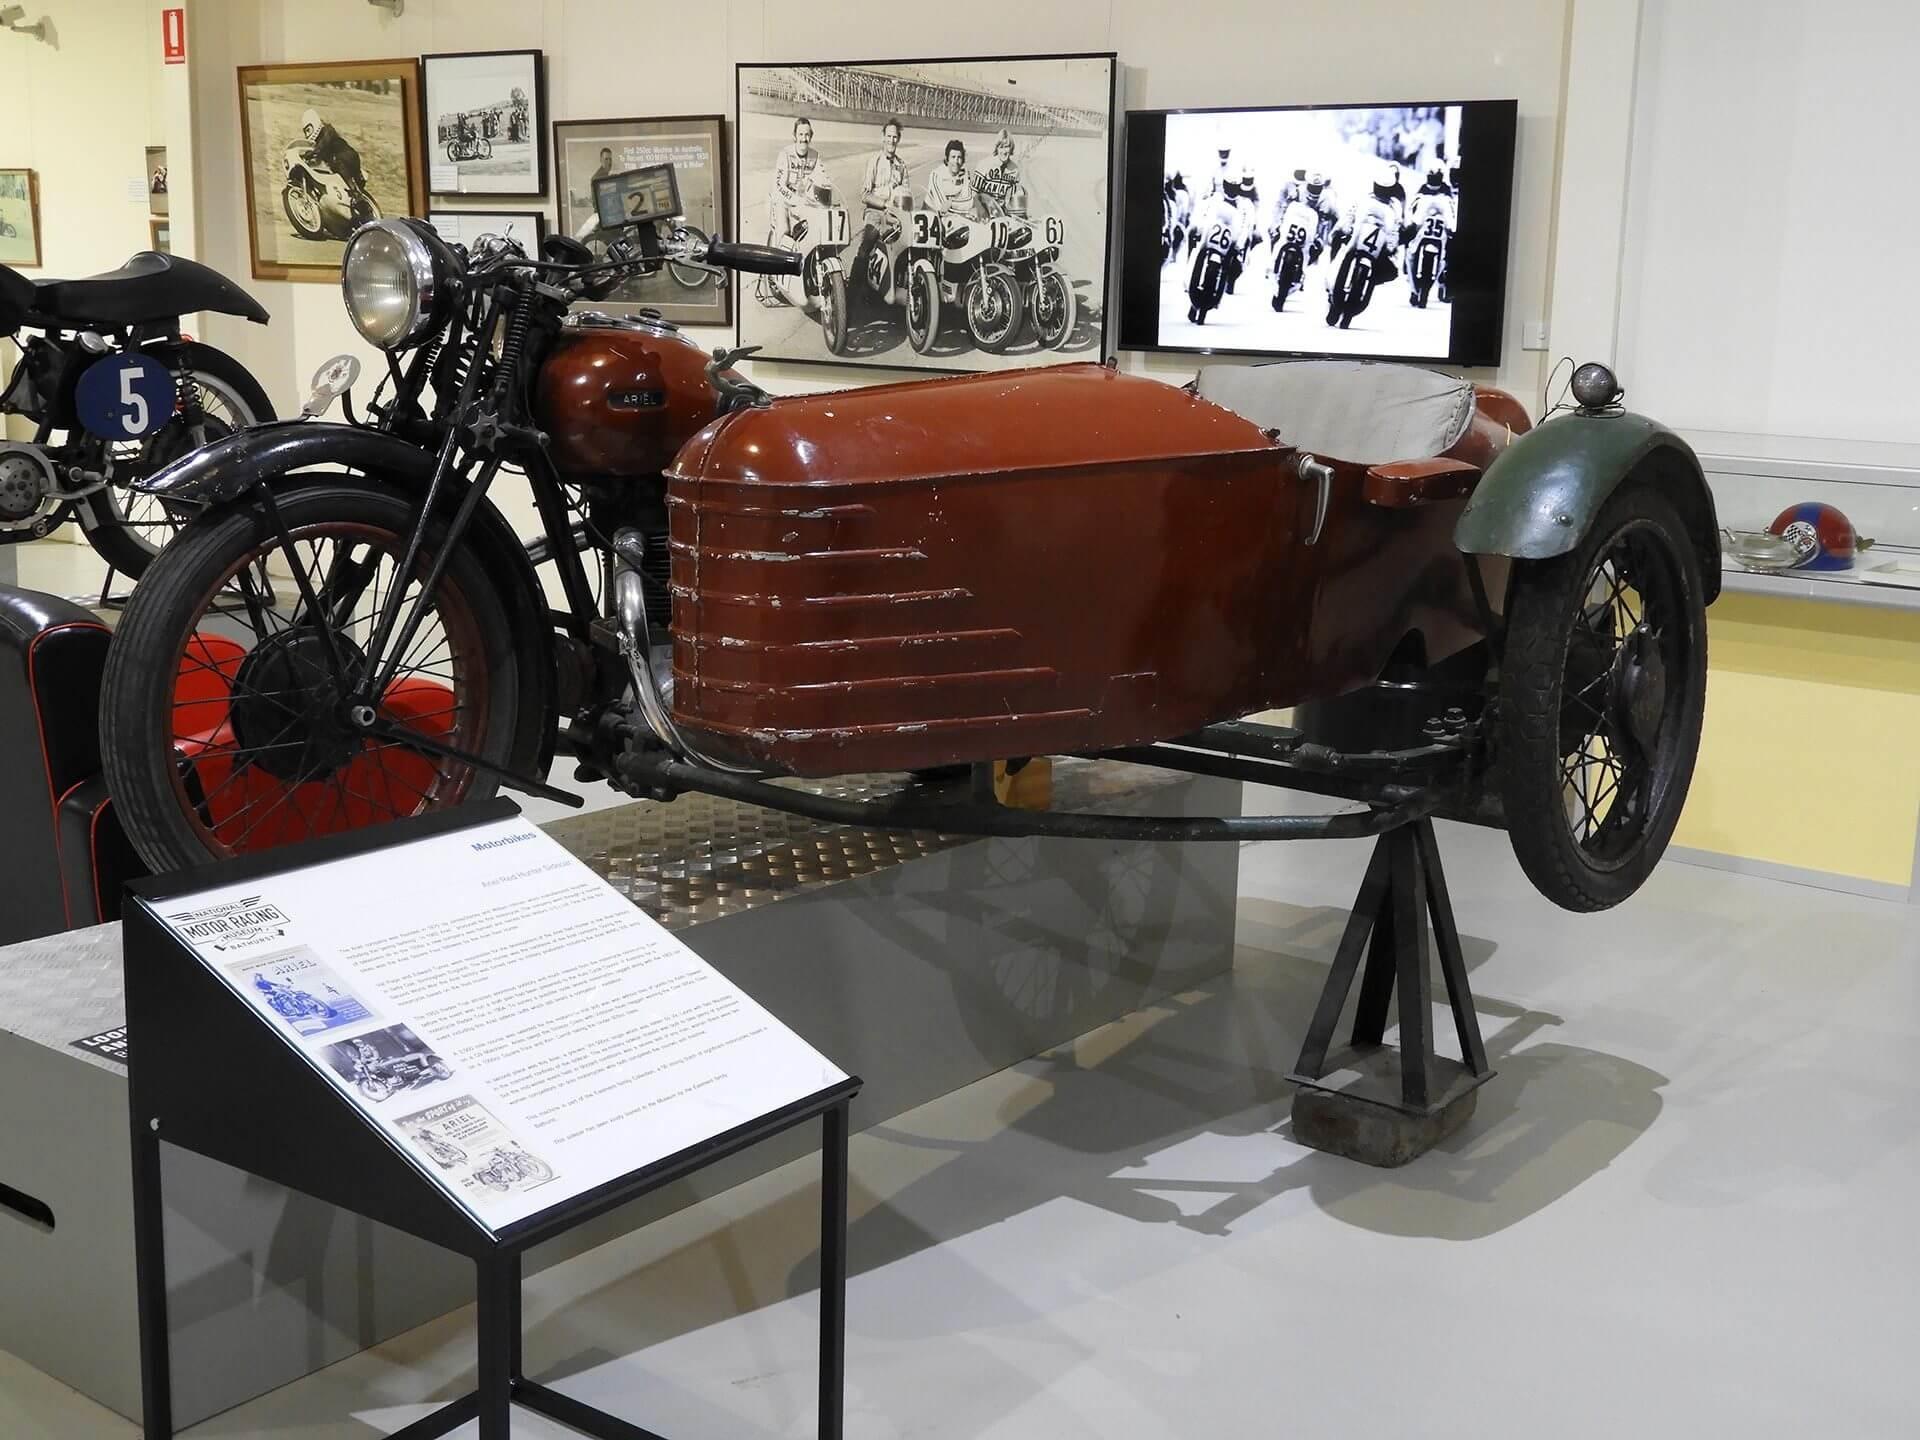 Vehicles at Bathurst National Motor Racing Museum